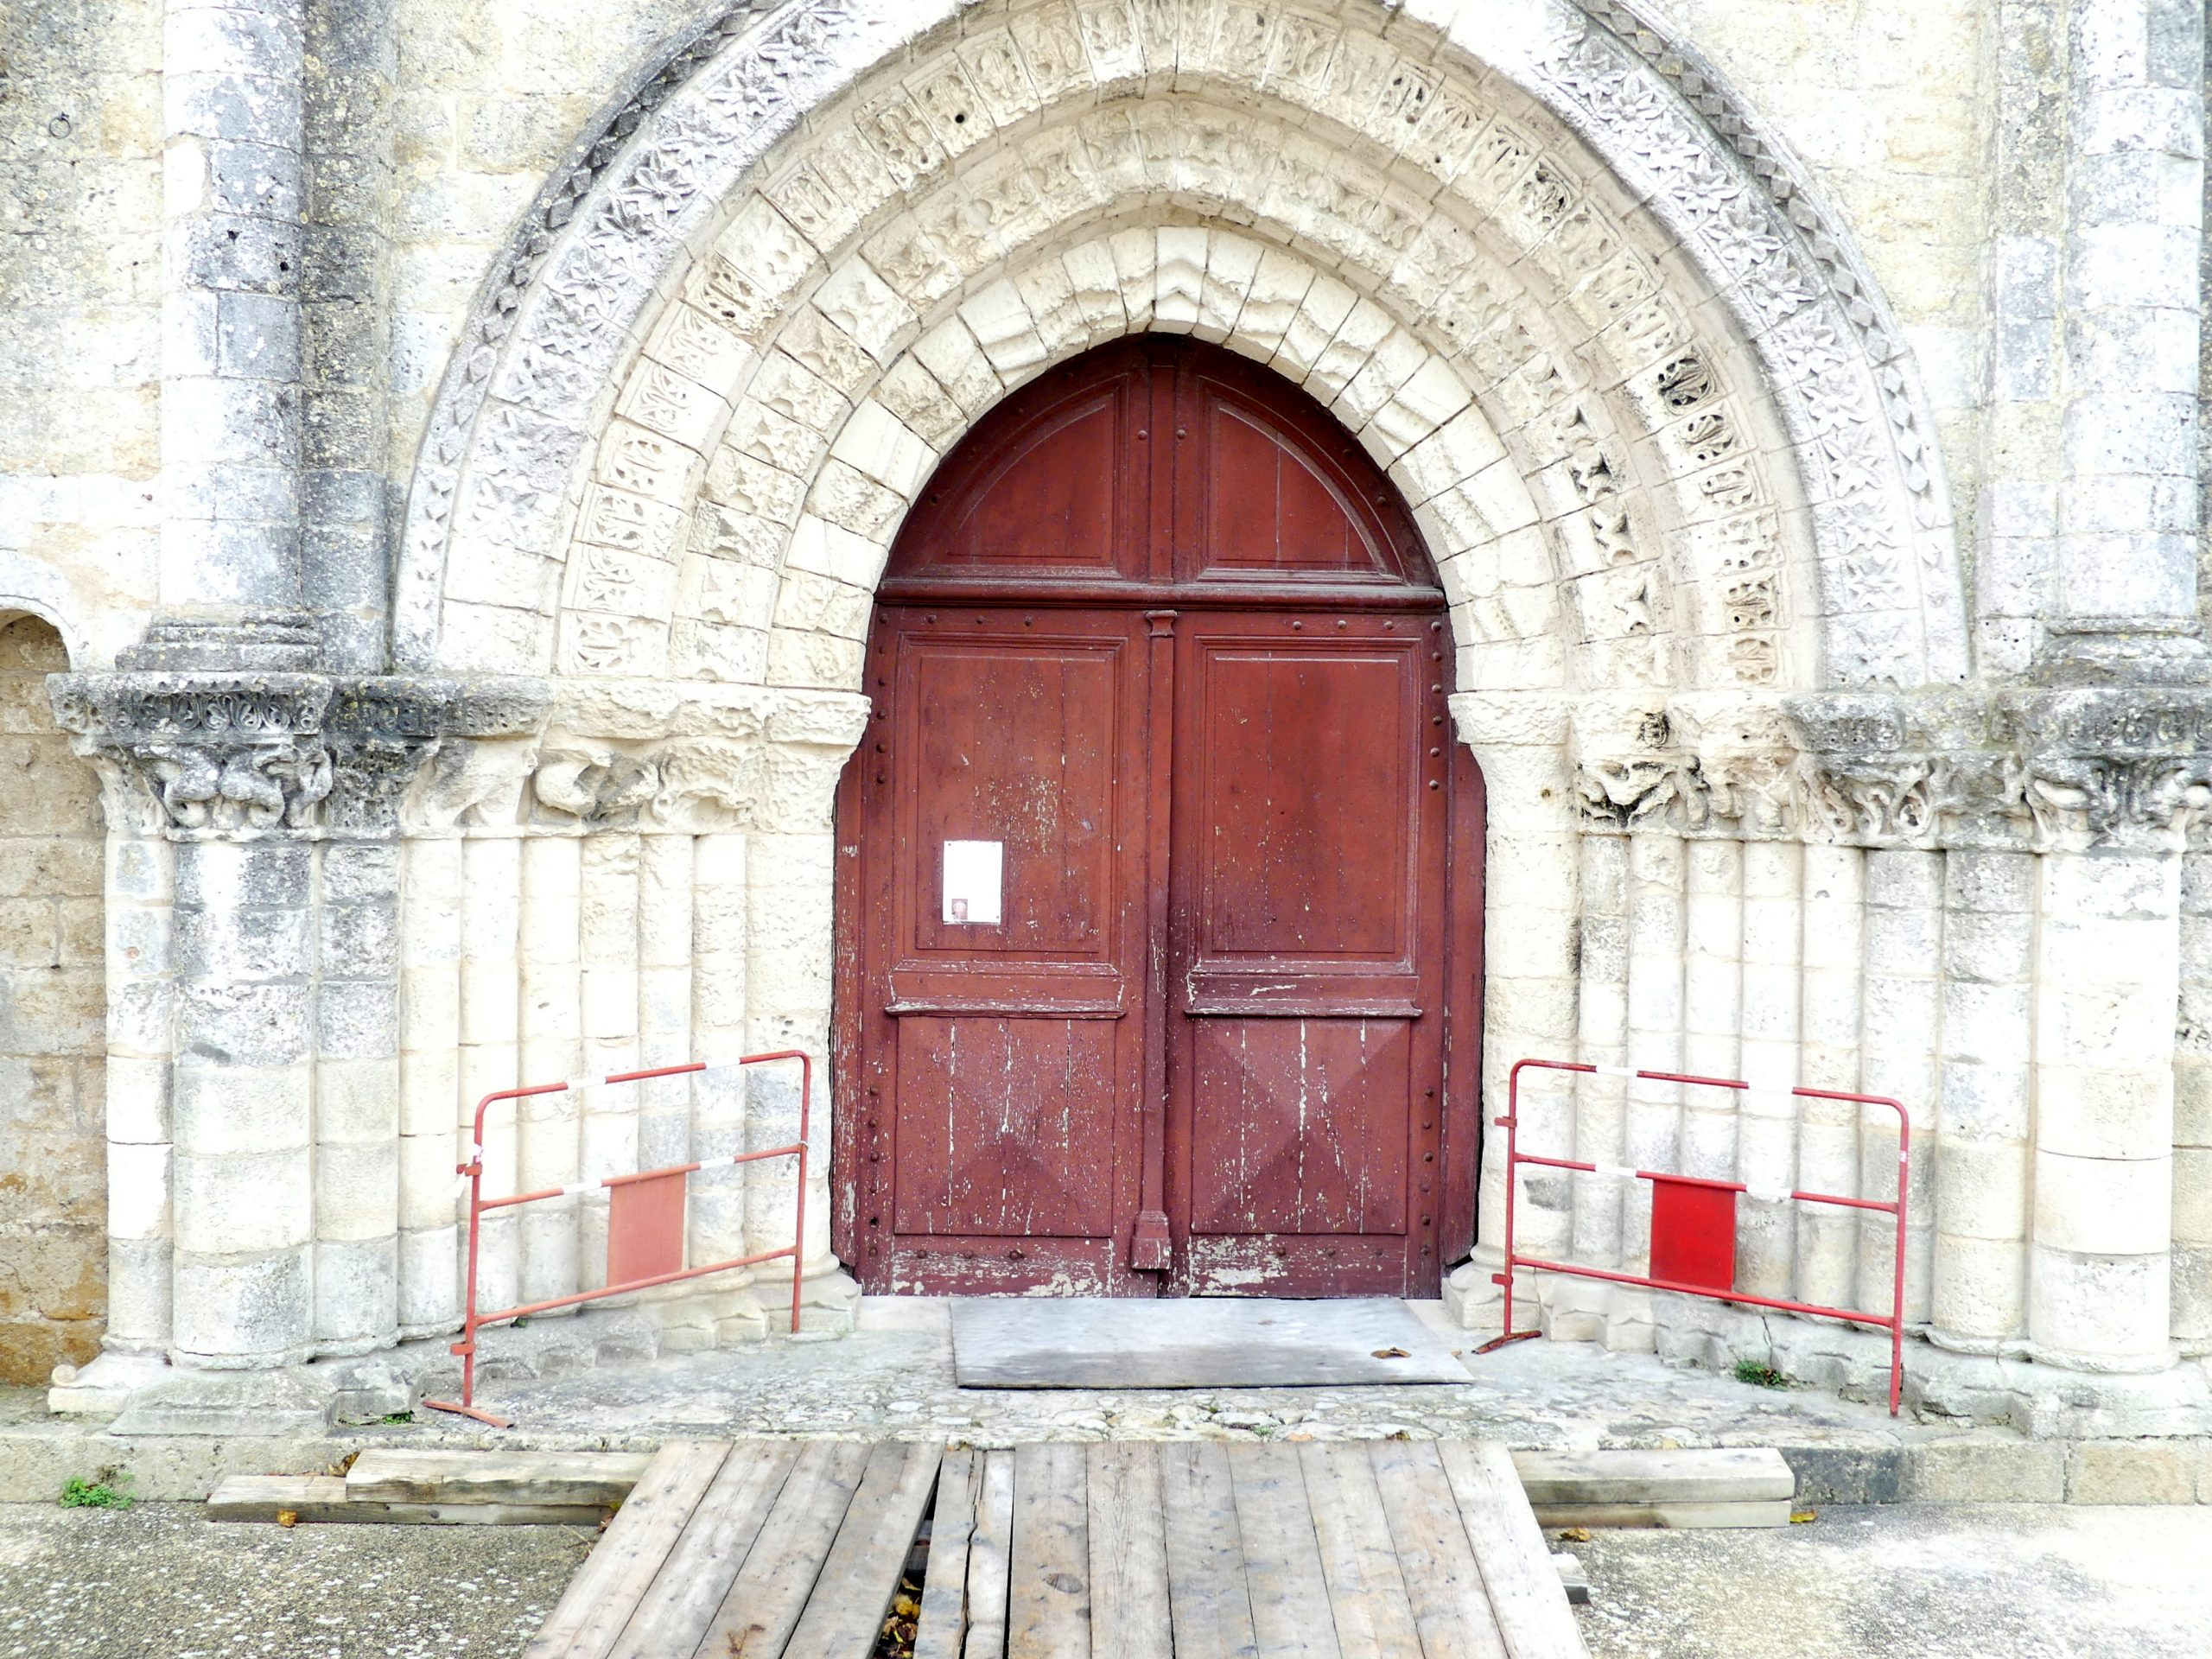 Ars - Eglise - Porte entrée - 26 novembre 2019